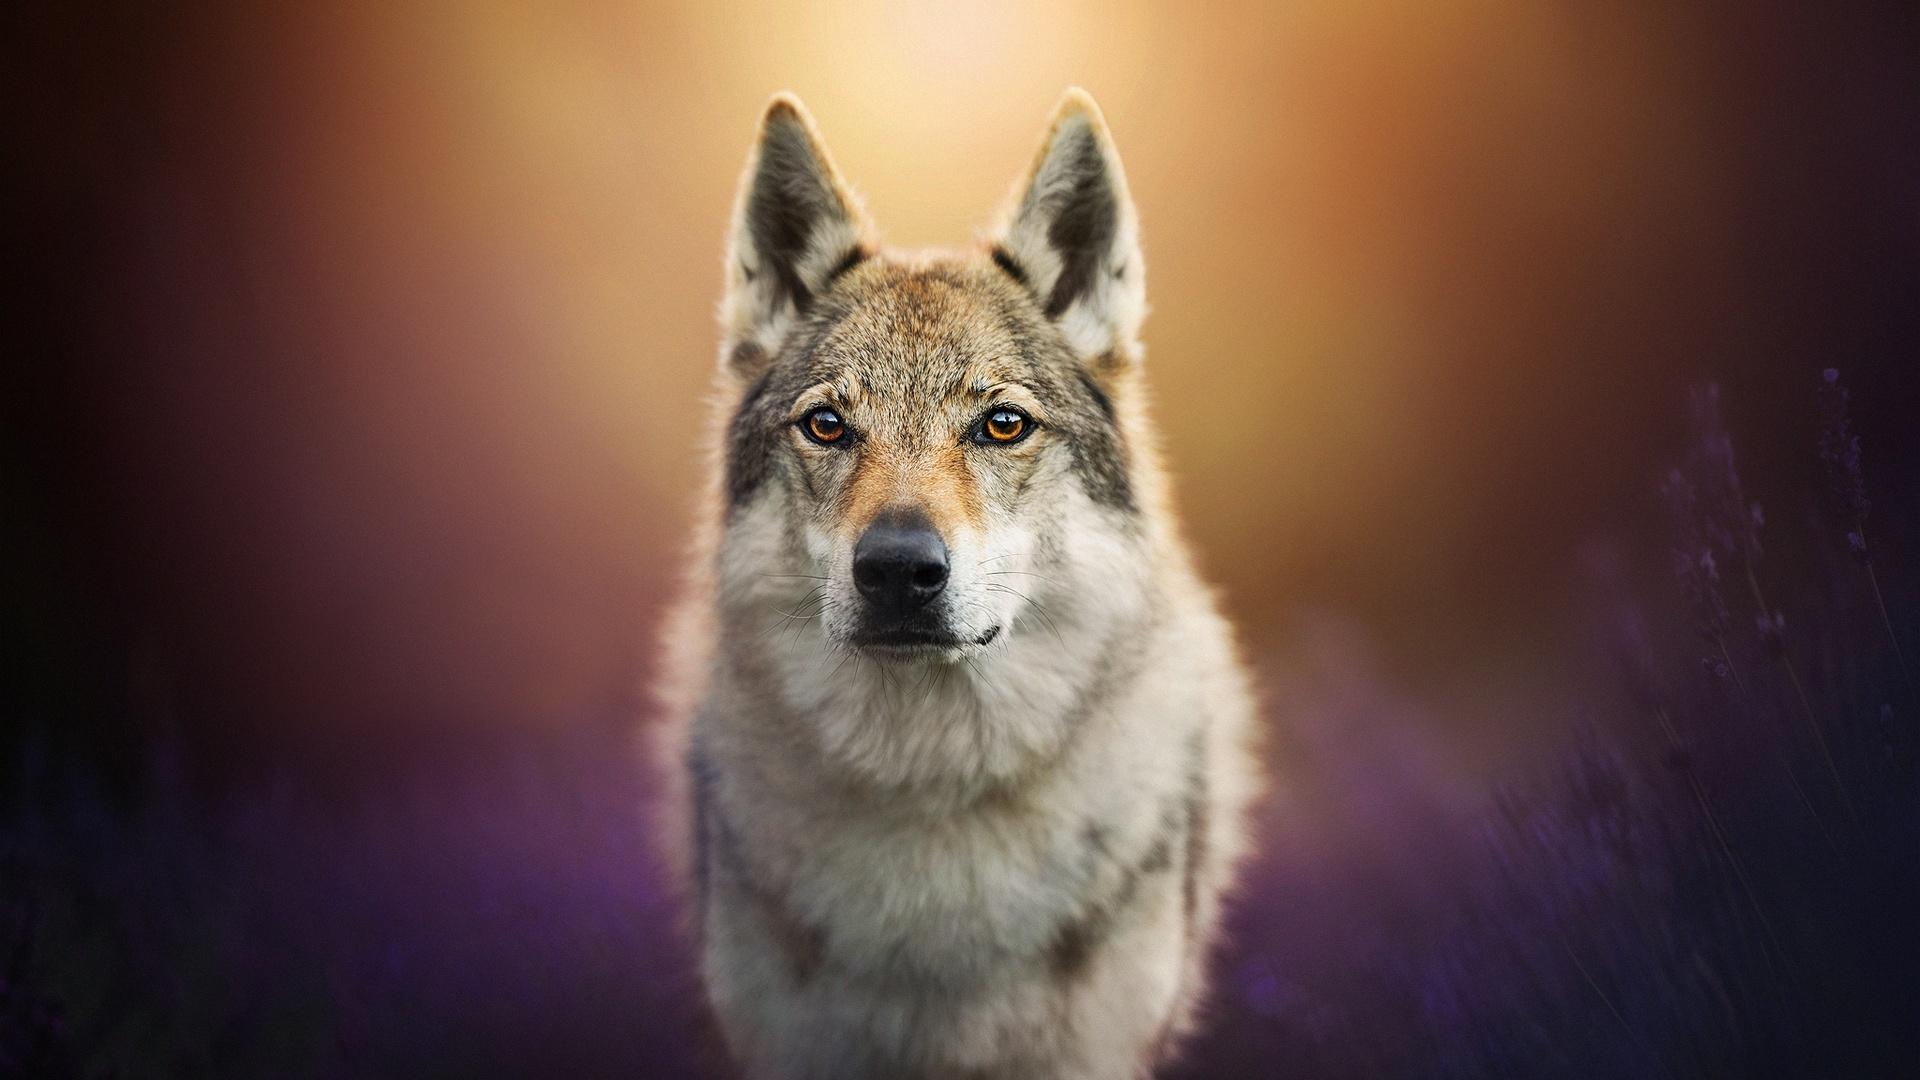 Wolfdog Wallpapers Wallpaper Cave